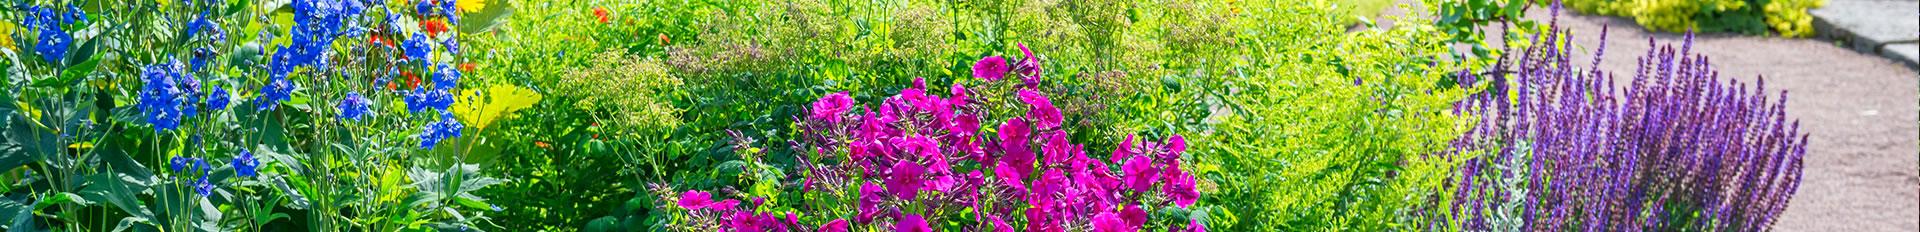 Tributes | Pinecrest Memorial Gardens & Crematory